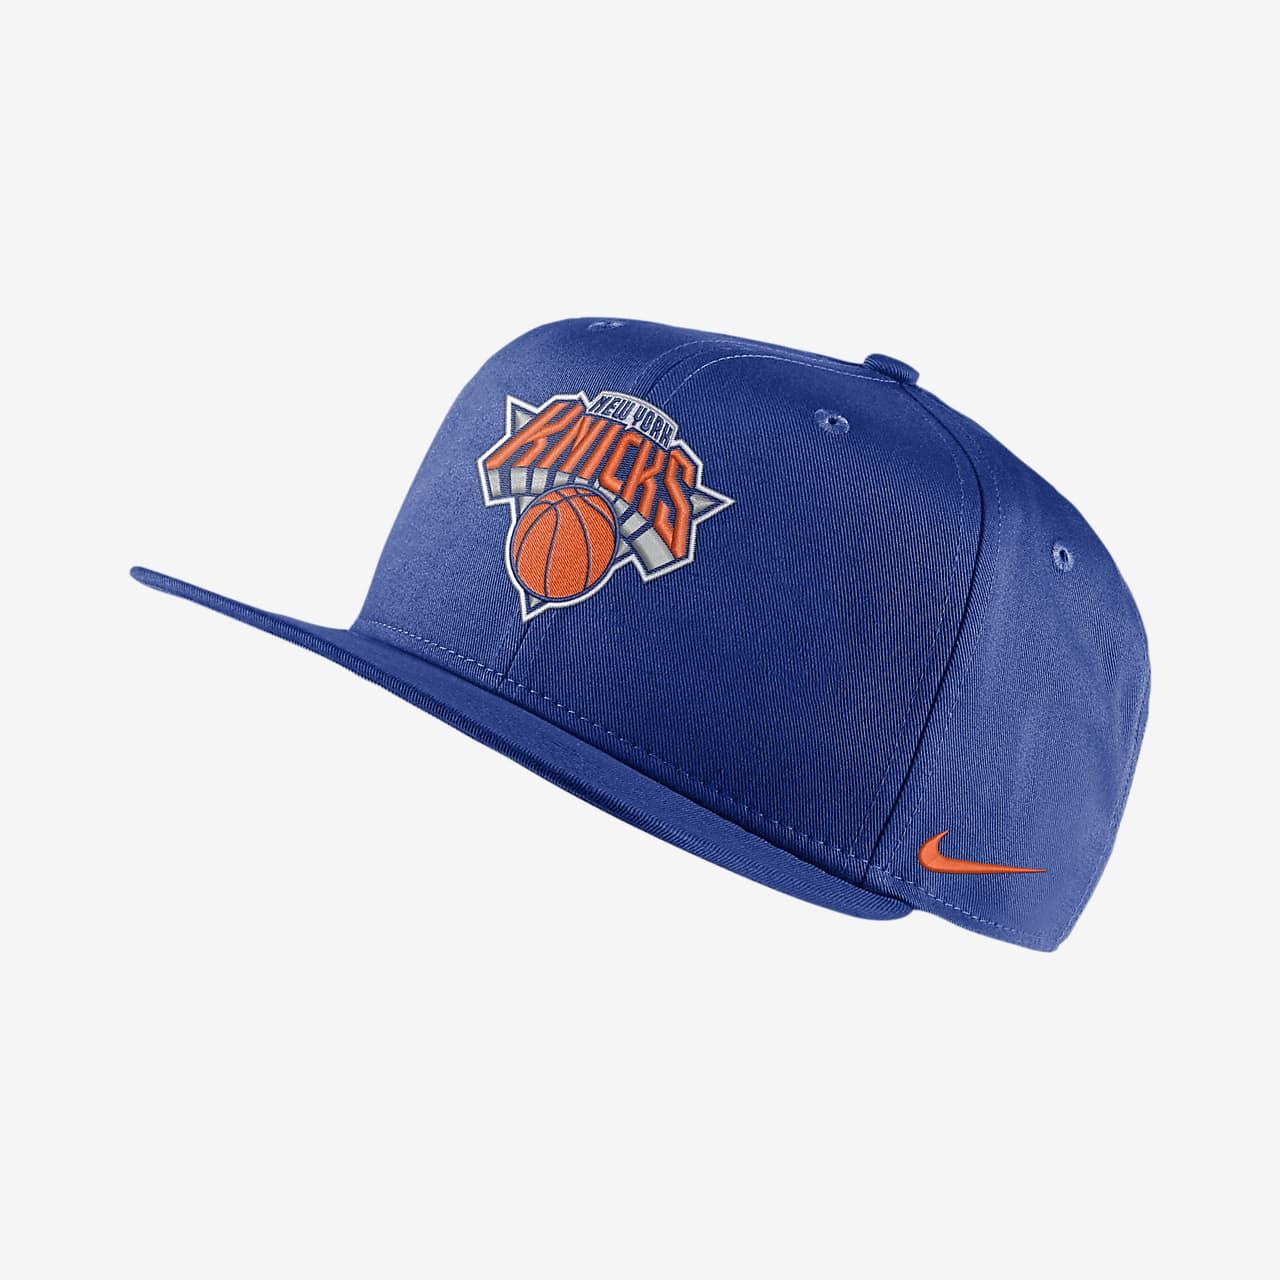 New York Knicks Nike Pro NBA-caps